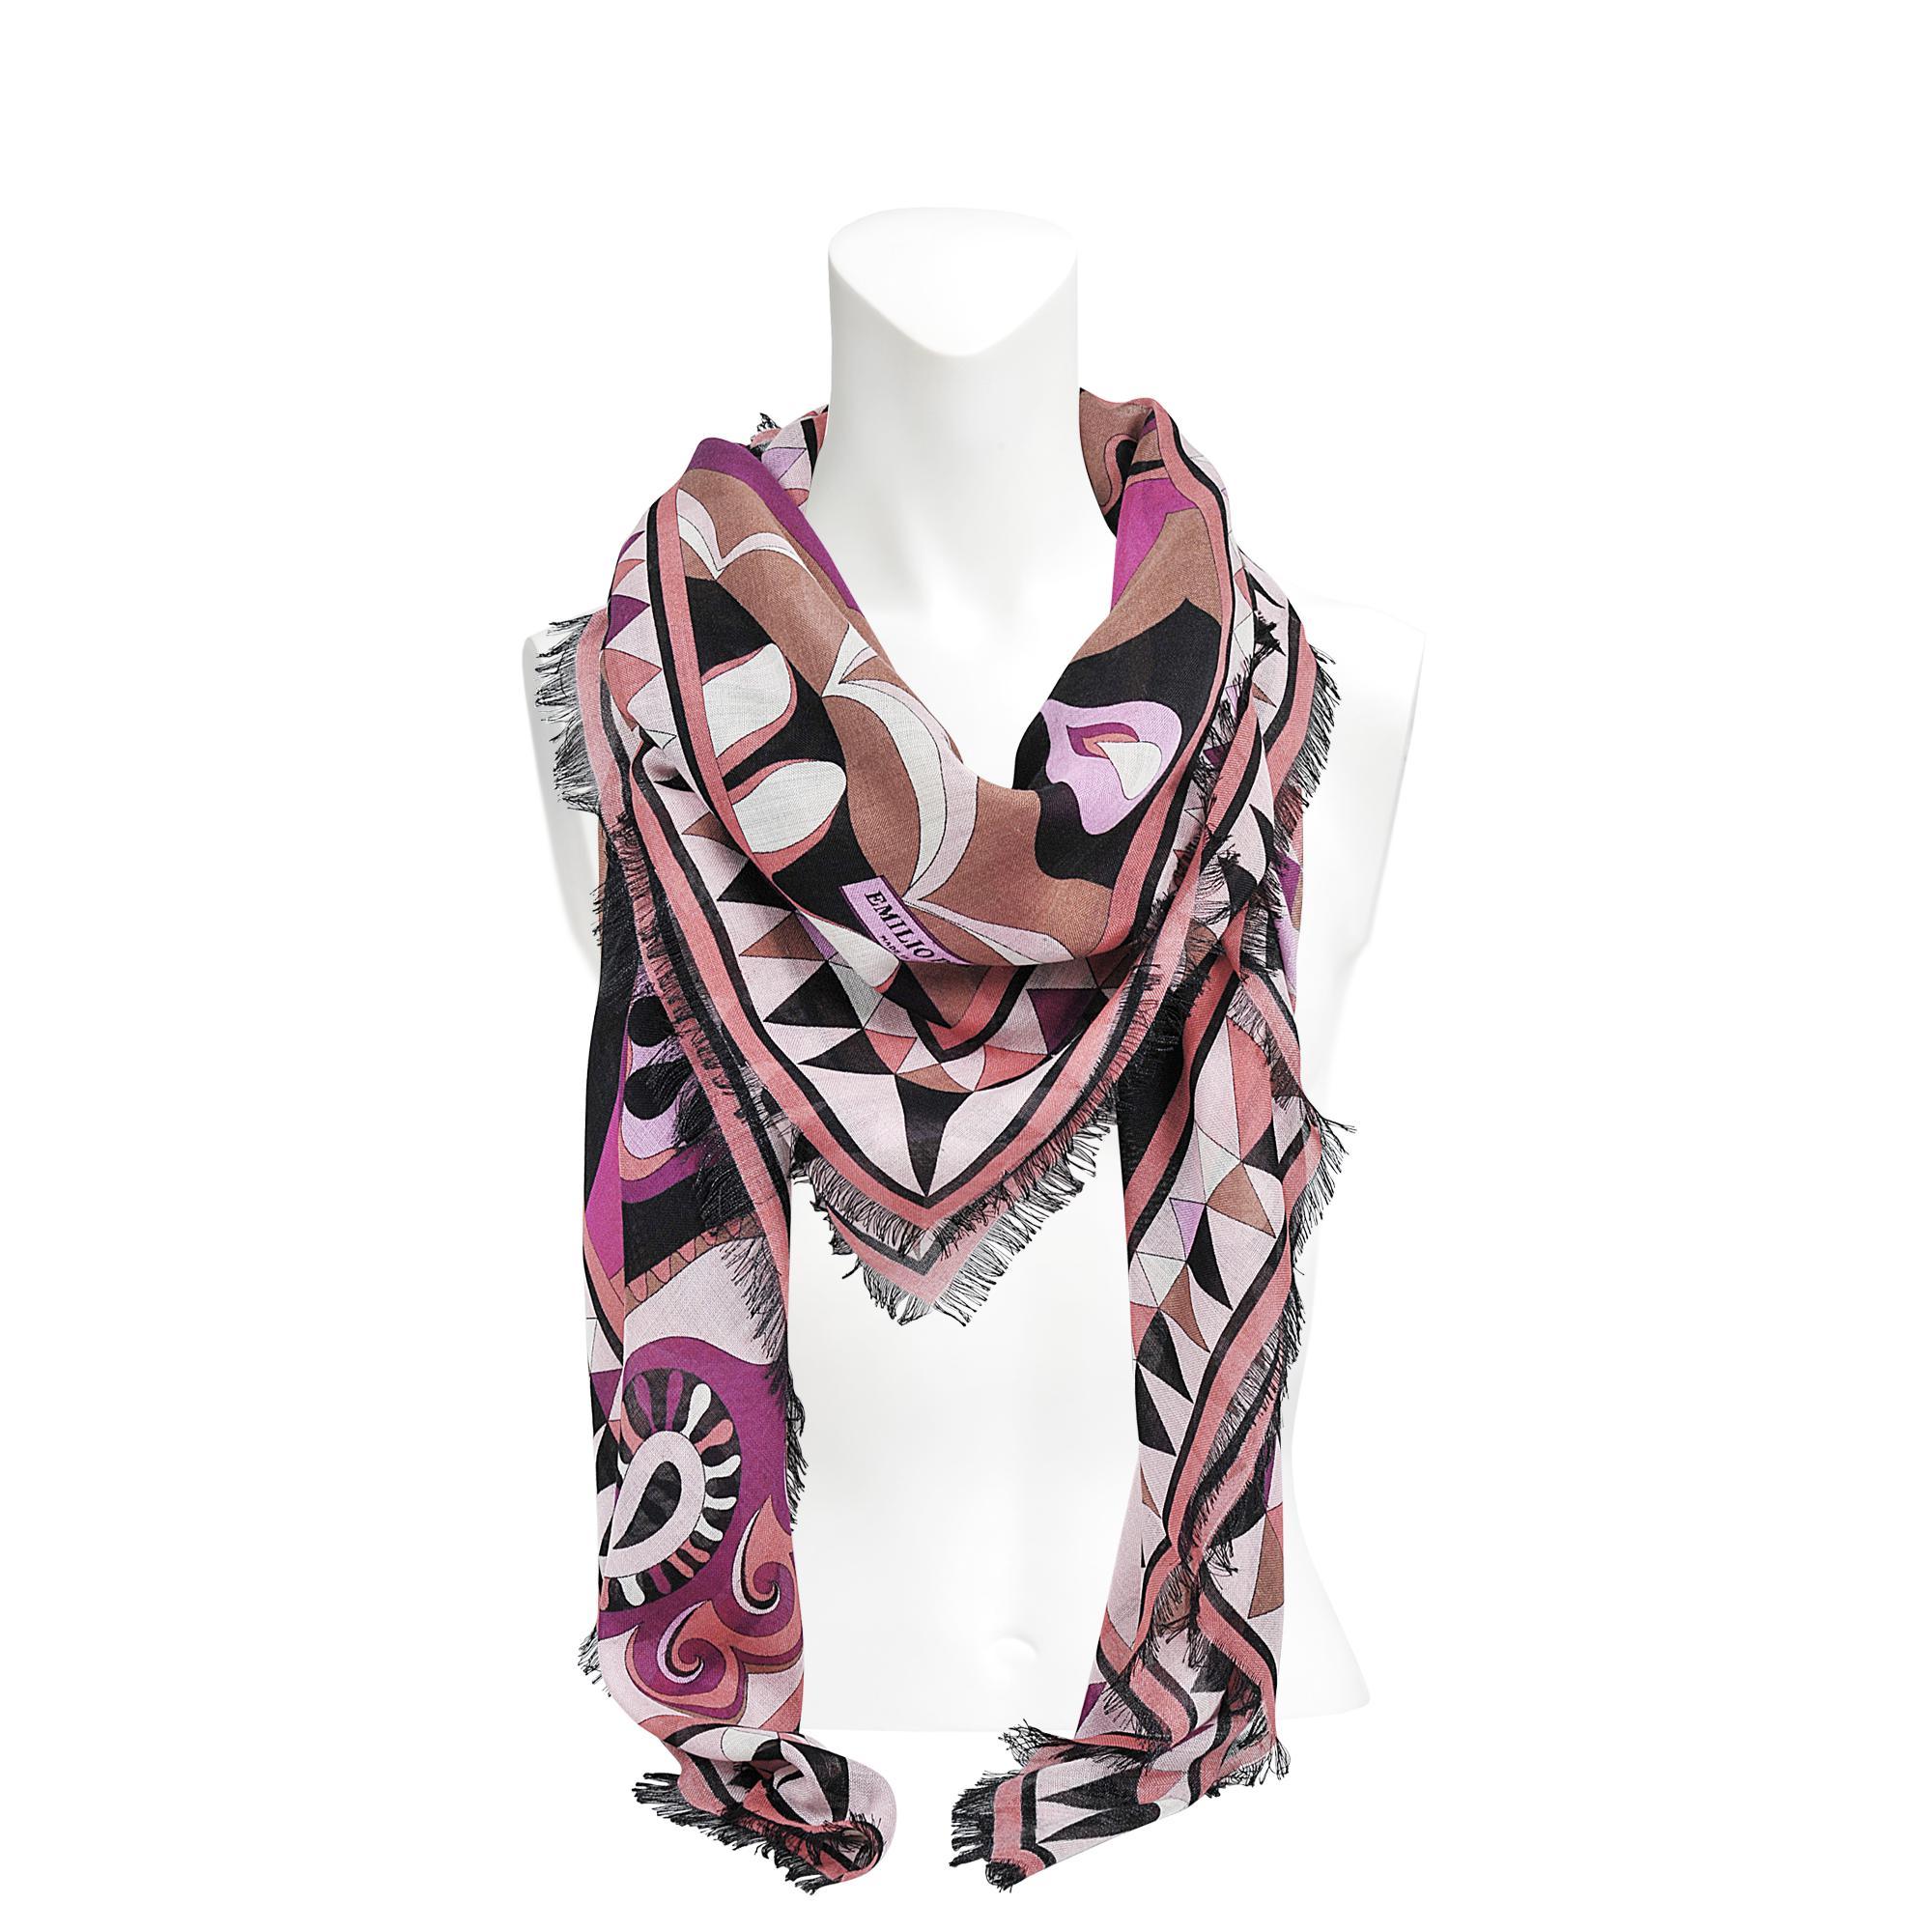 135x135 cm cashmere and silk macro stole Paisley print Emilio Pucci Ps5j3glPS